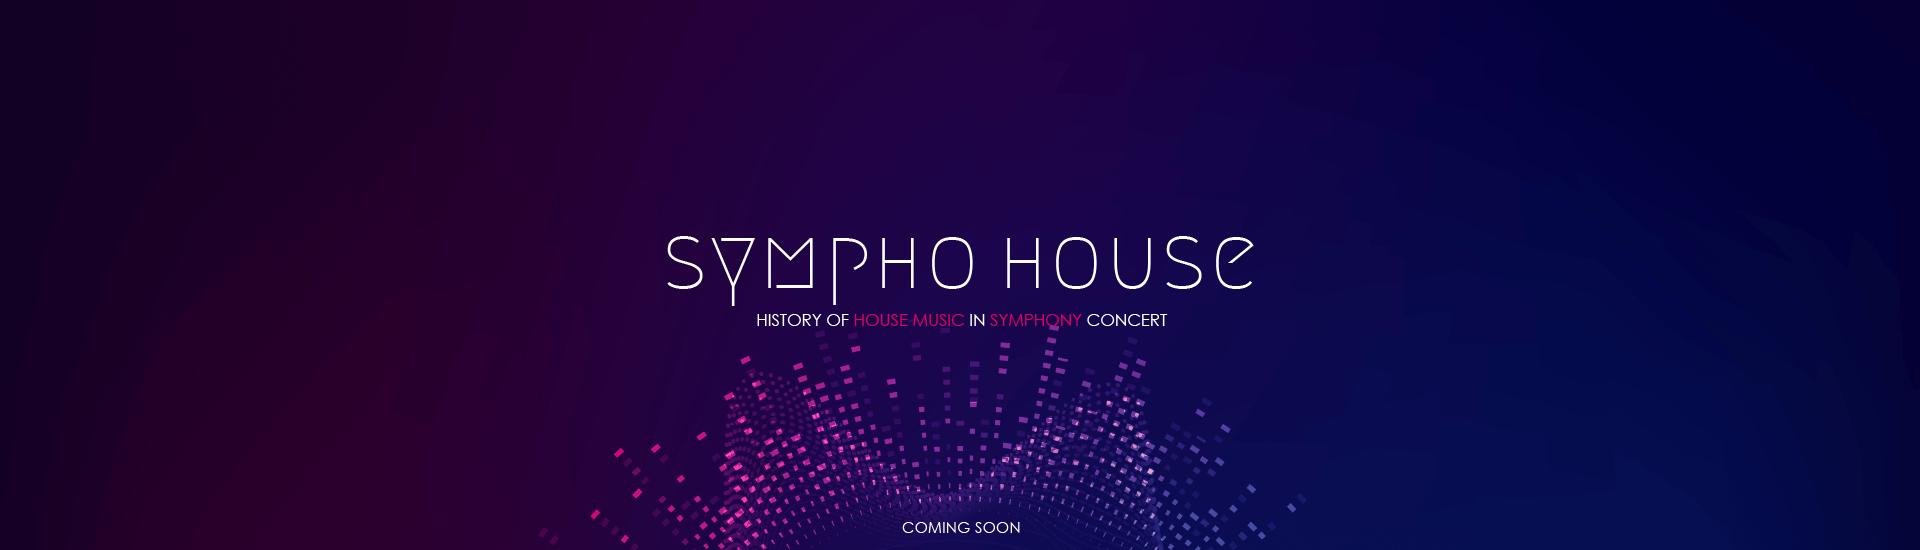 sympho-house-in-concert